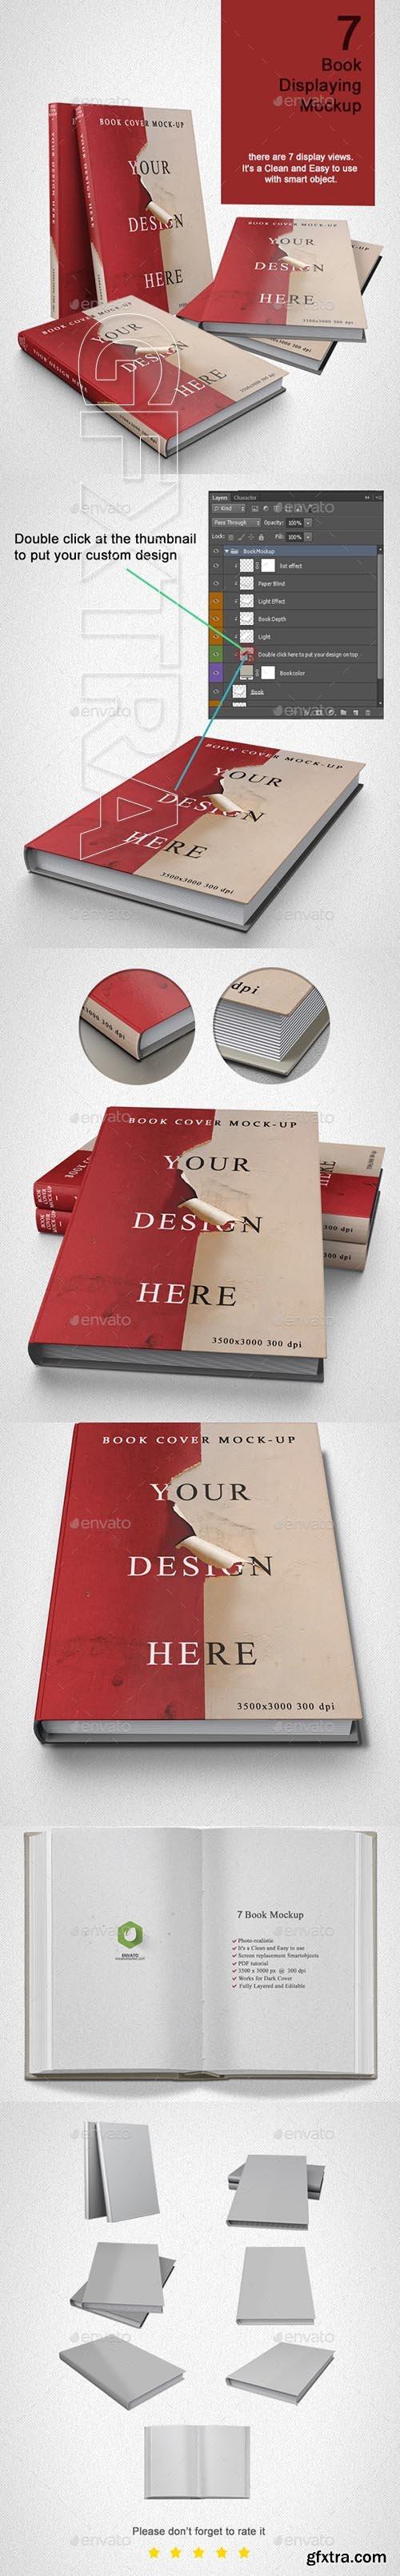 GraphicRiver - Book Mock up - 7 Model 21973325